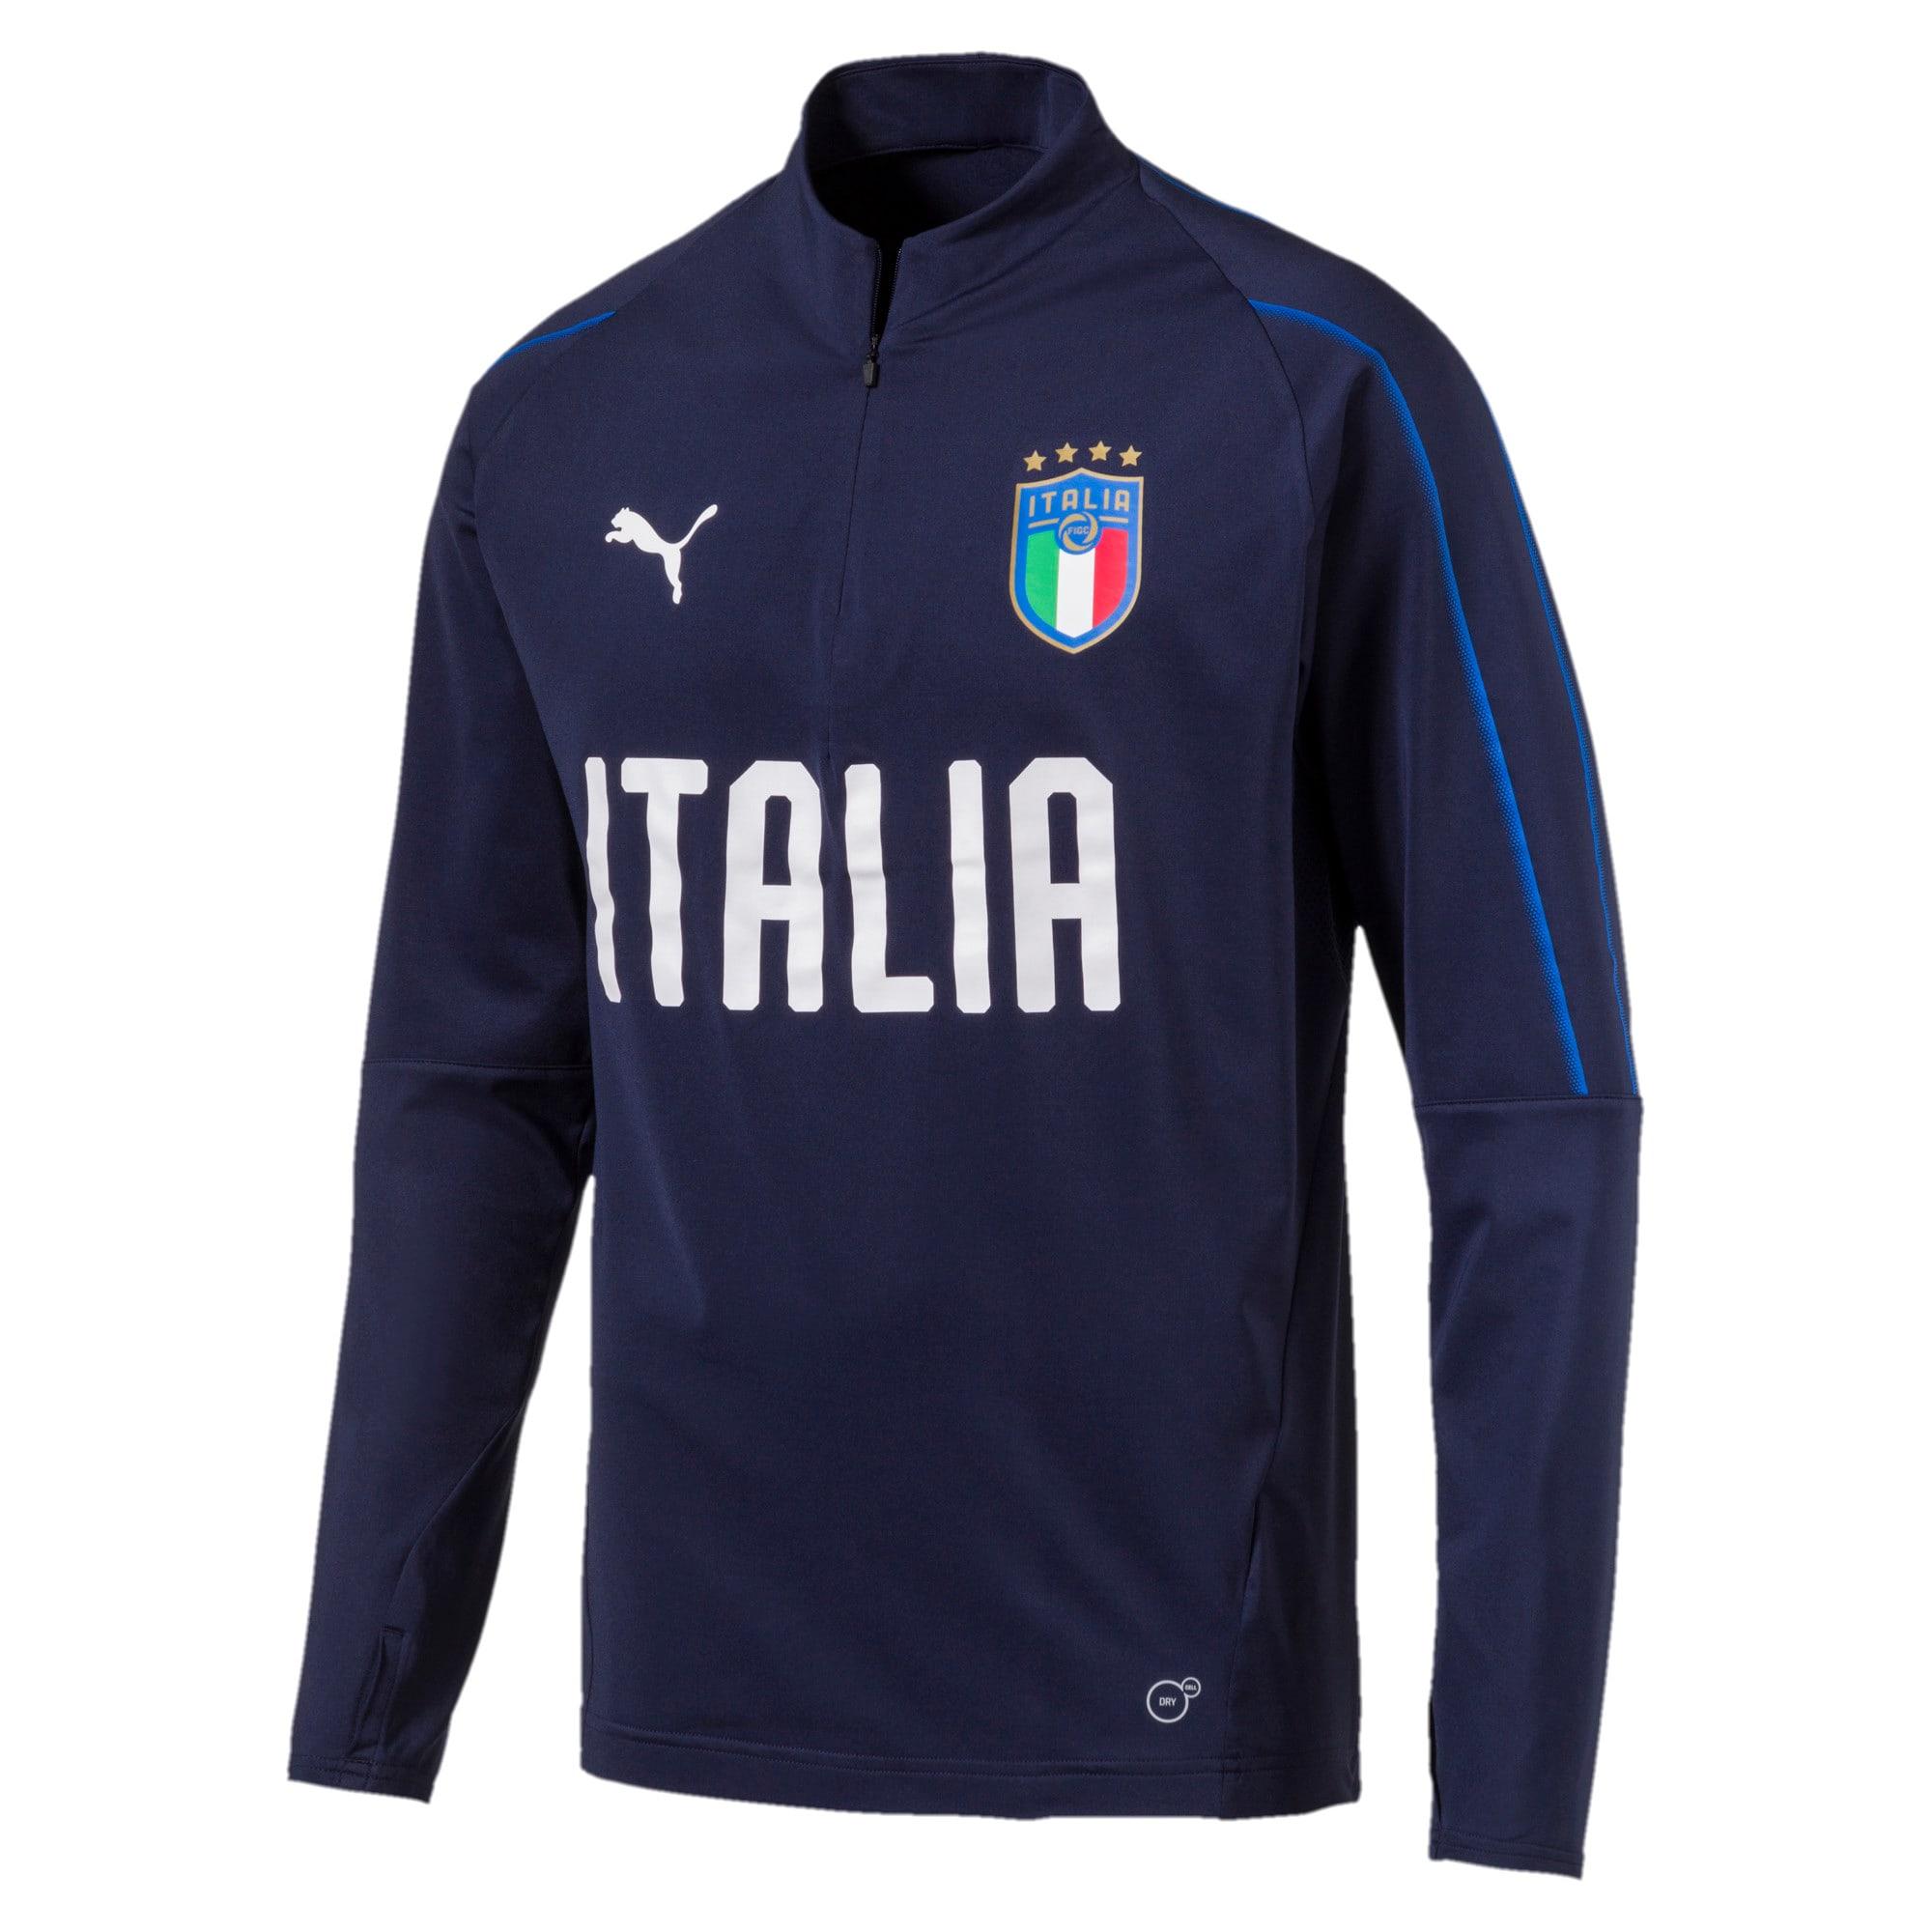 Thumbnail 1 of Italia 1/4 Zip Training Top, Peacoat-Team Power Blue, medium